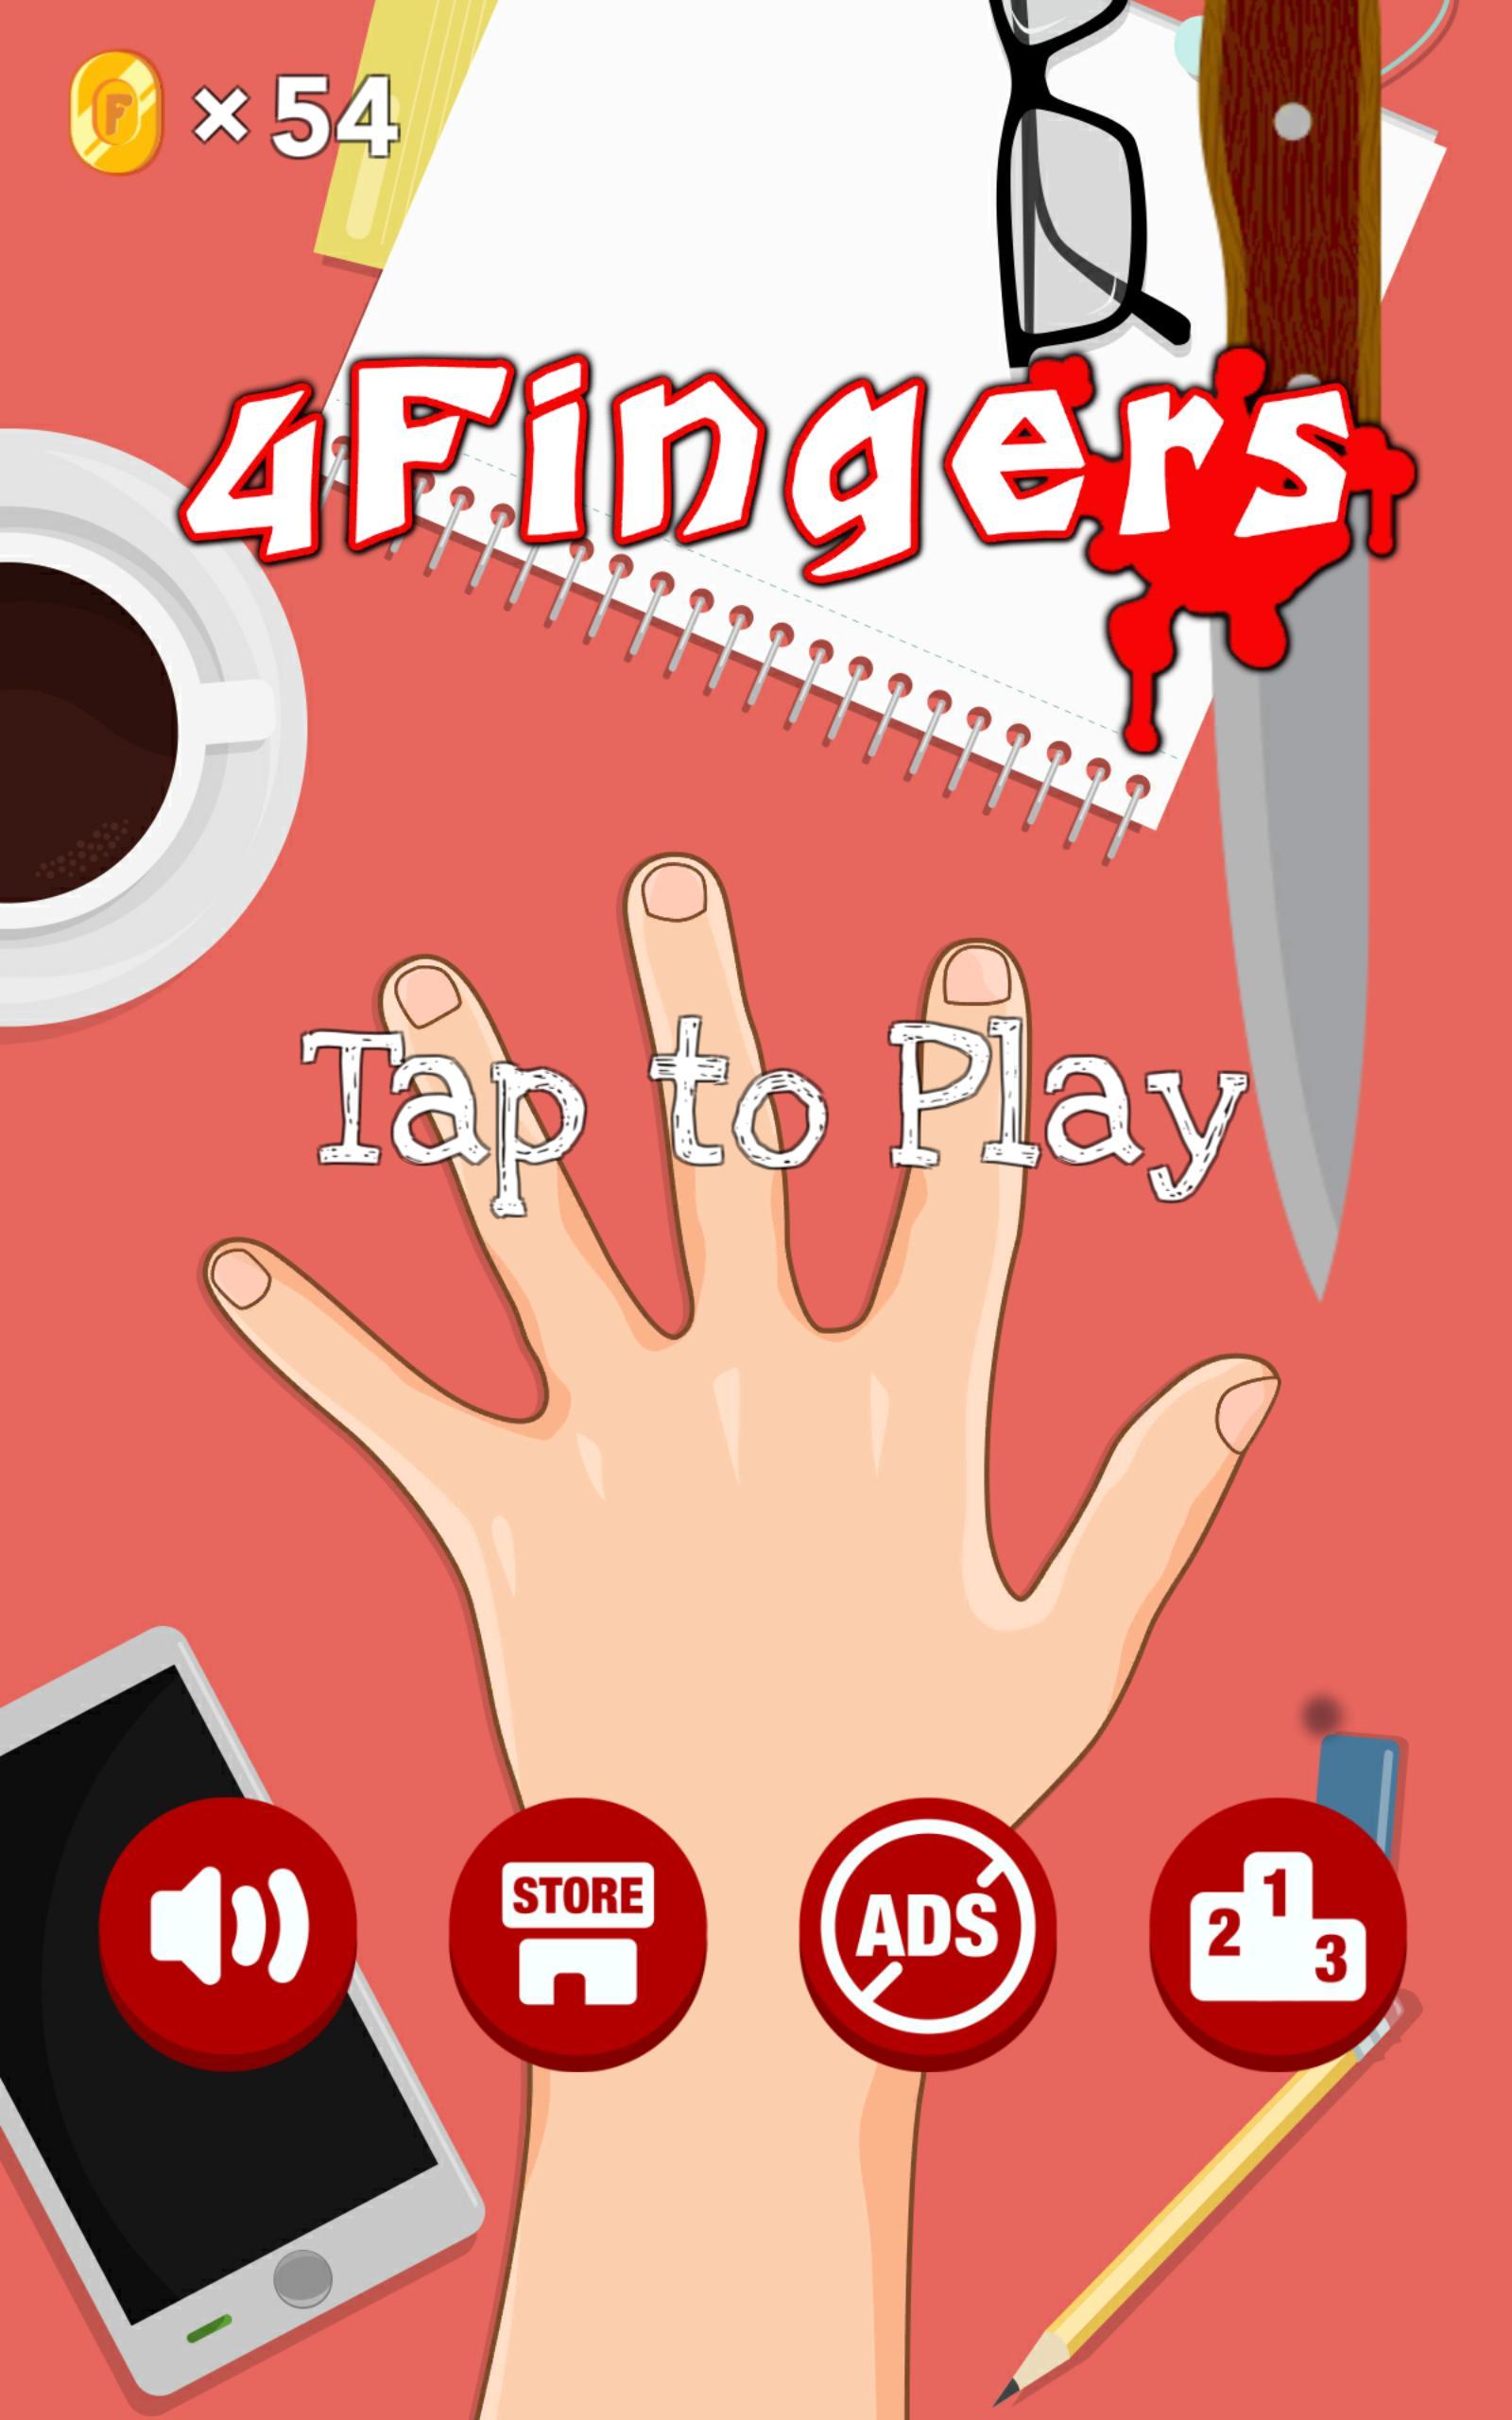 4 Fingers - free knife games 3.4 Screenshot 1